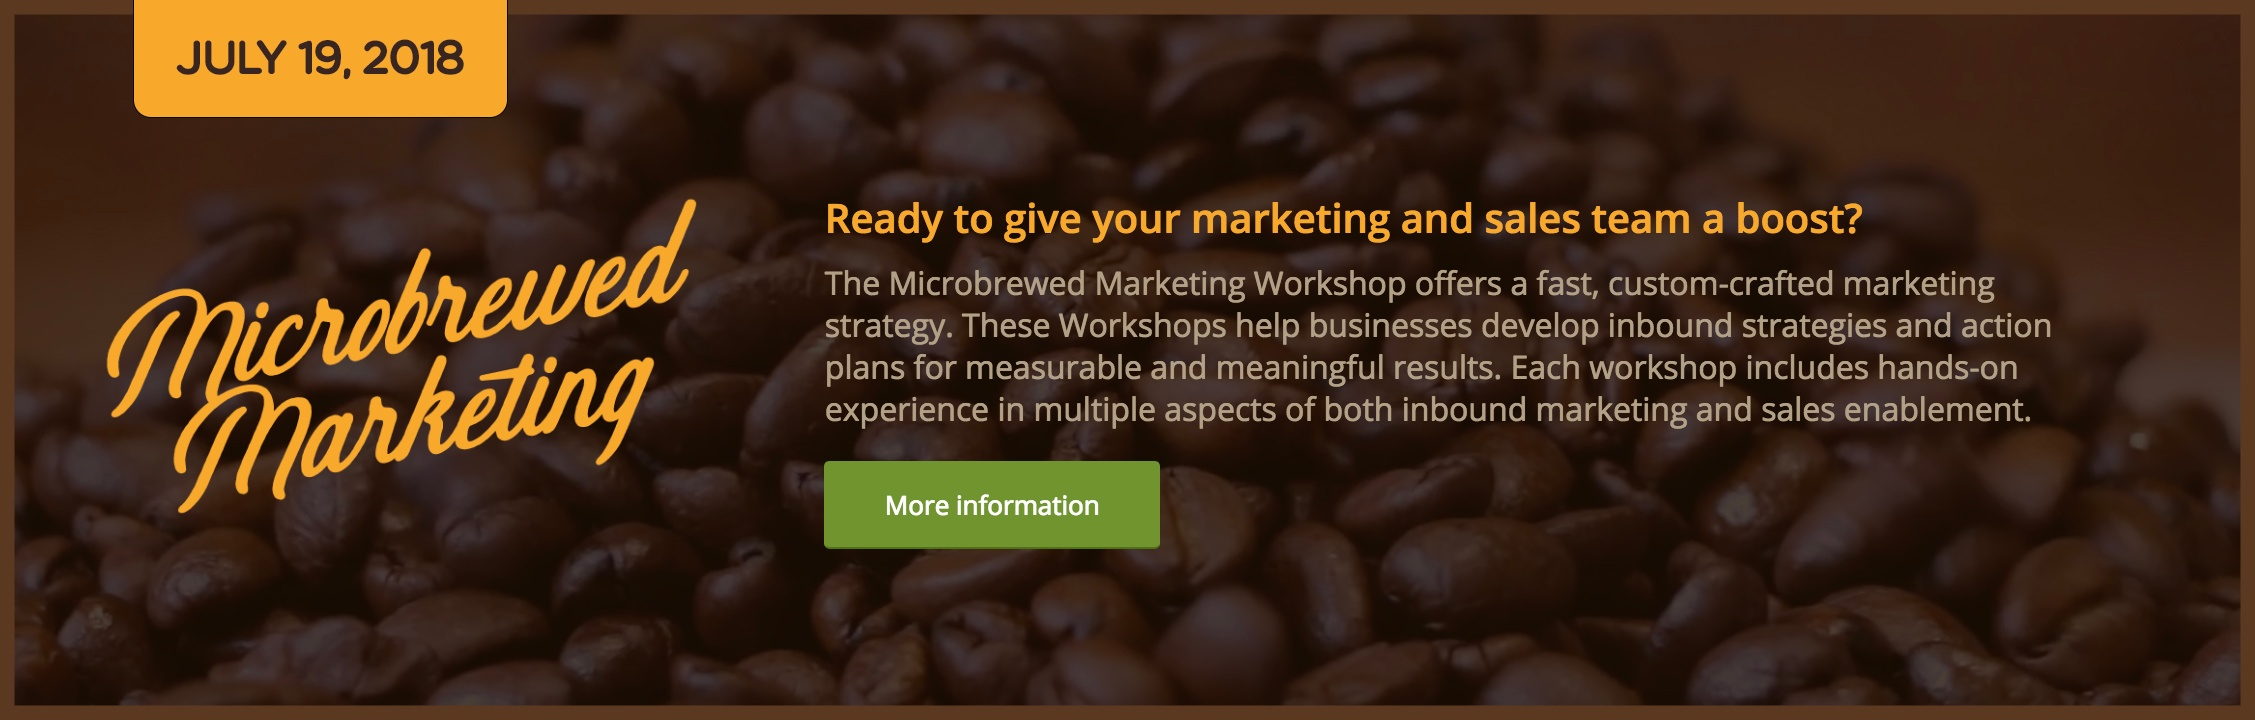 microbrewed-marketing-workshop-banner-ad-2